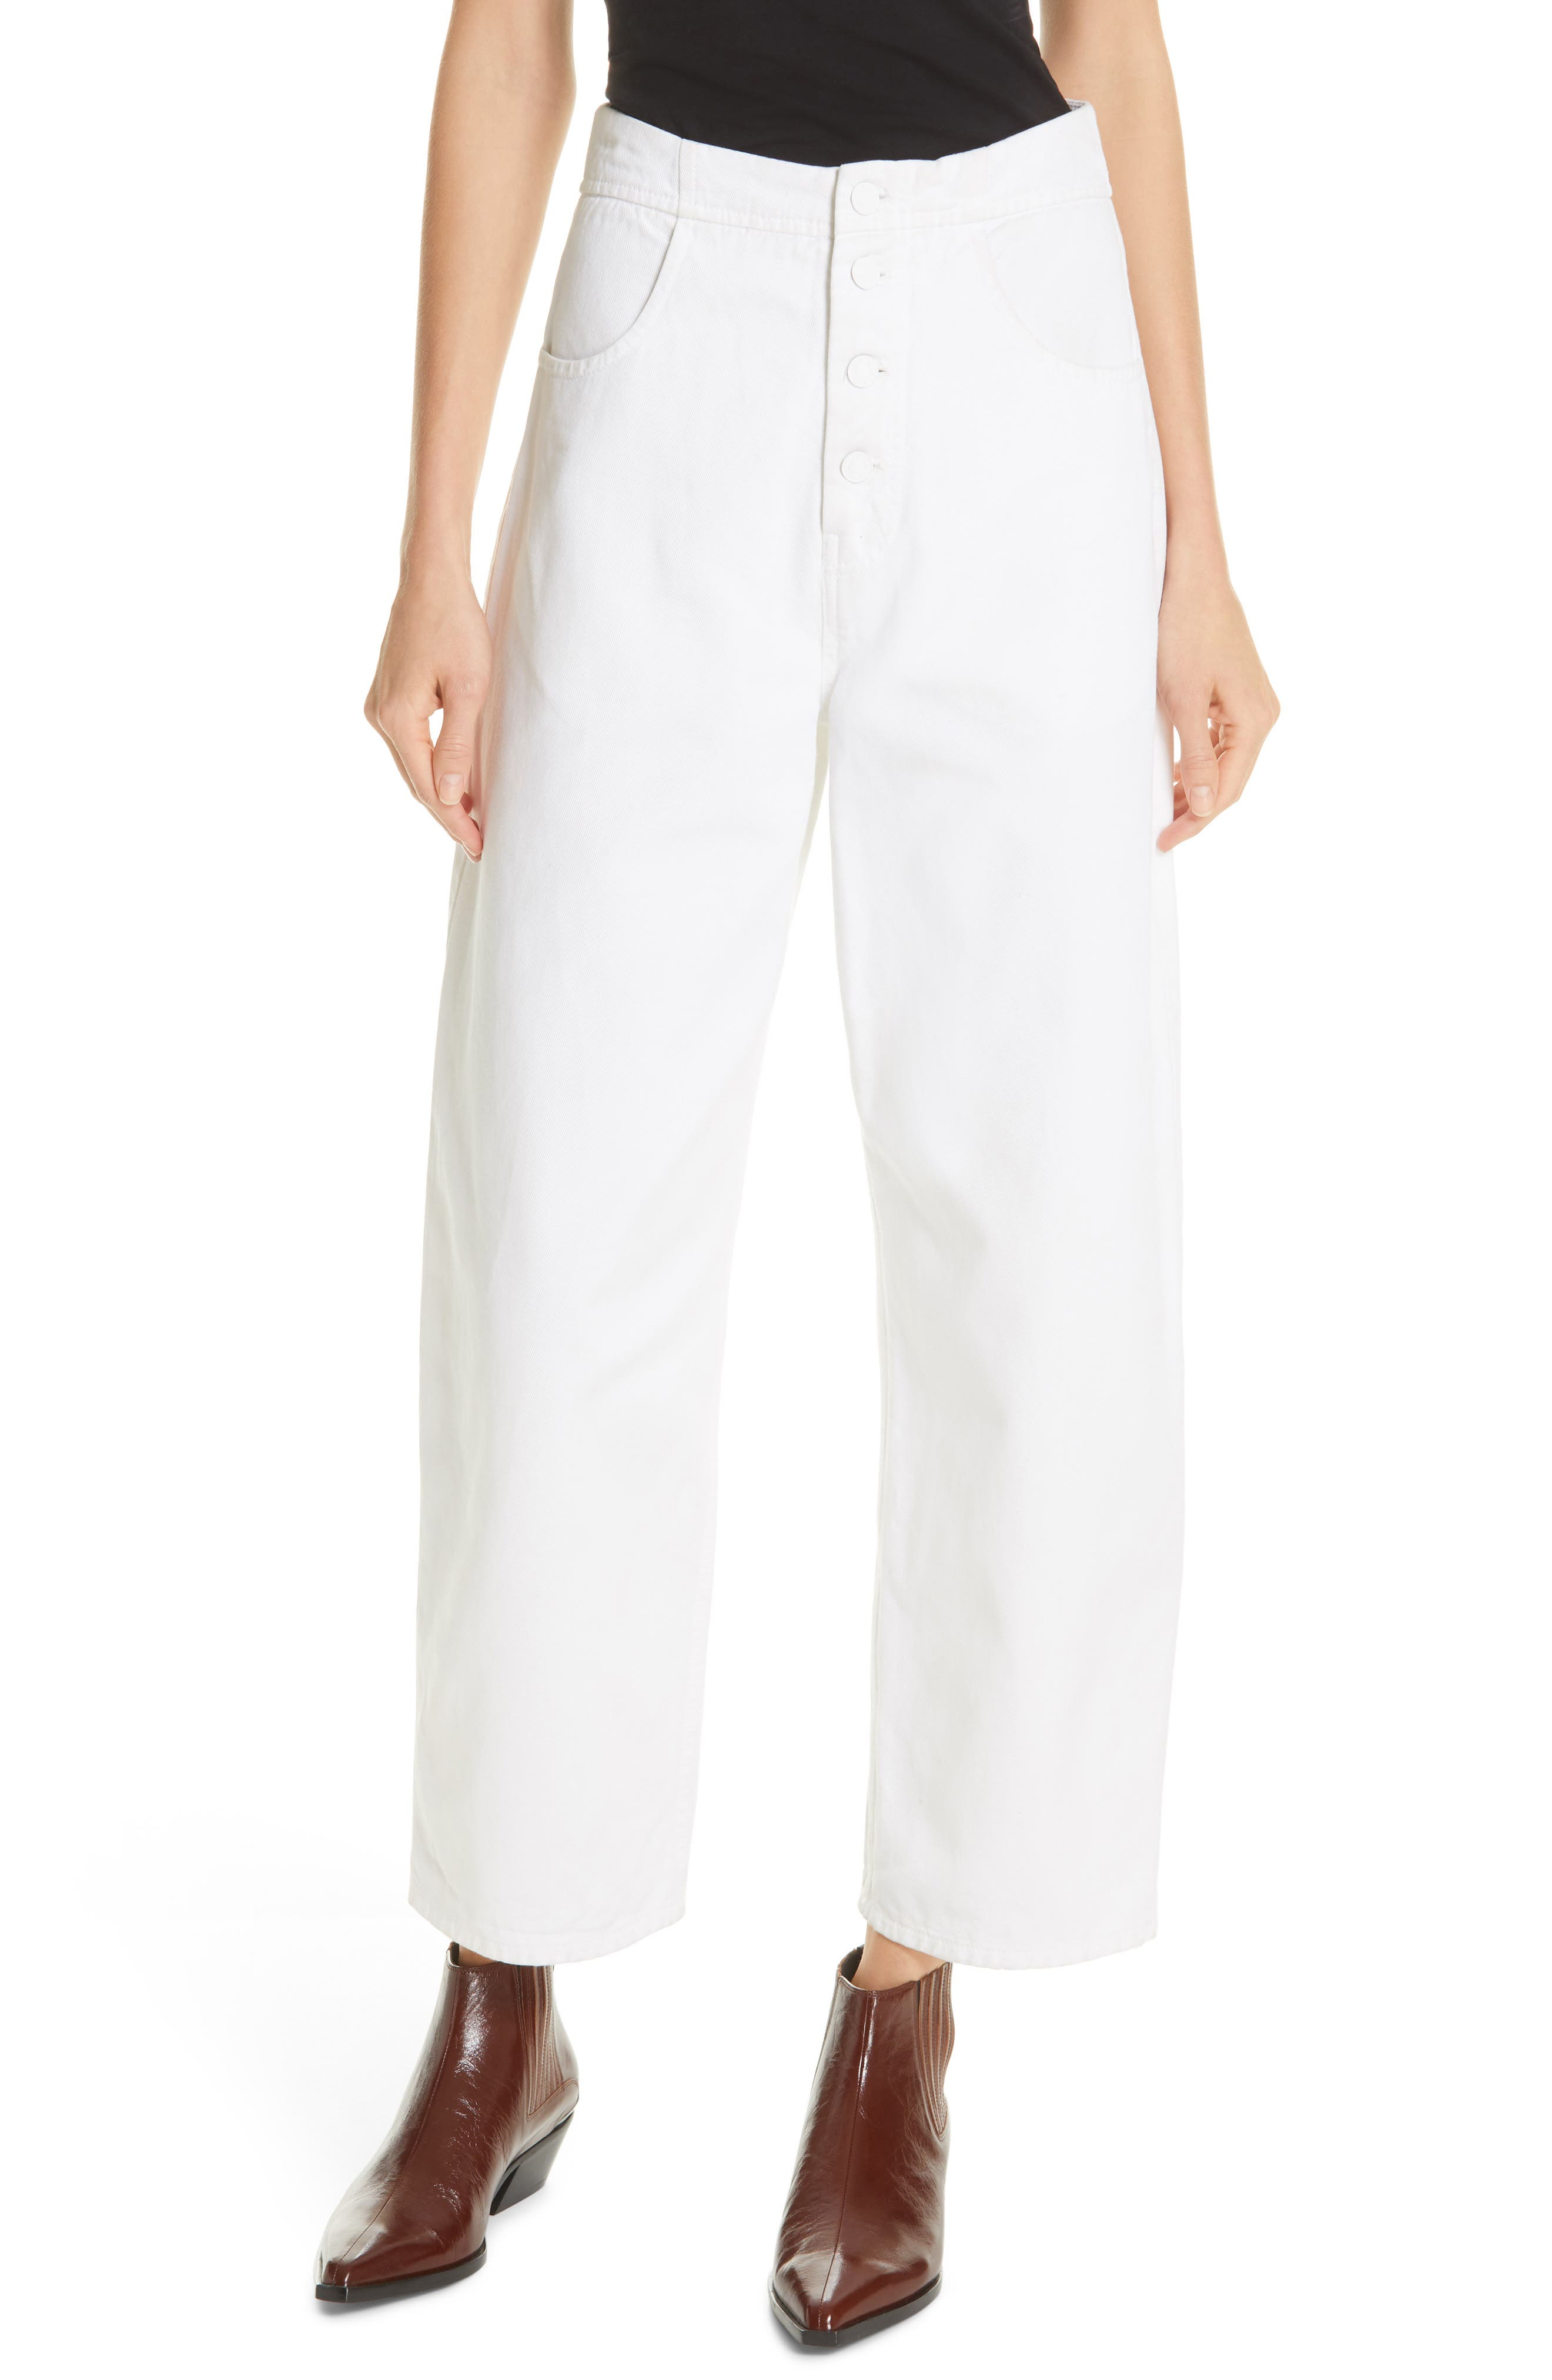 NILI LOTAN, Toledo Crop Cotton Pants, Main thumbnail 1, color, VINTAGE WHITE